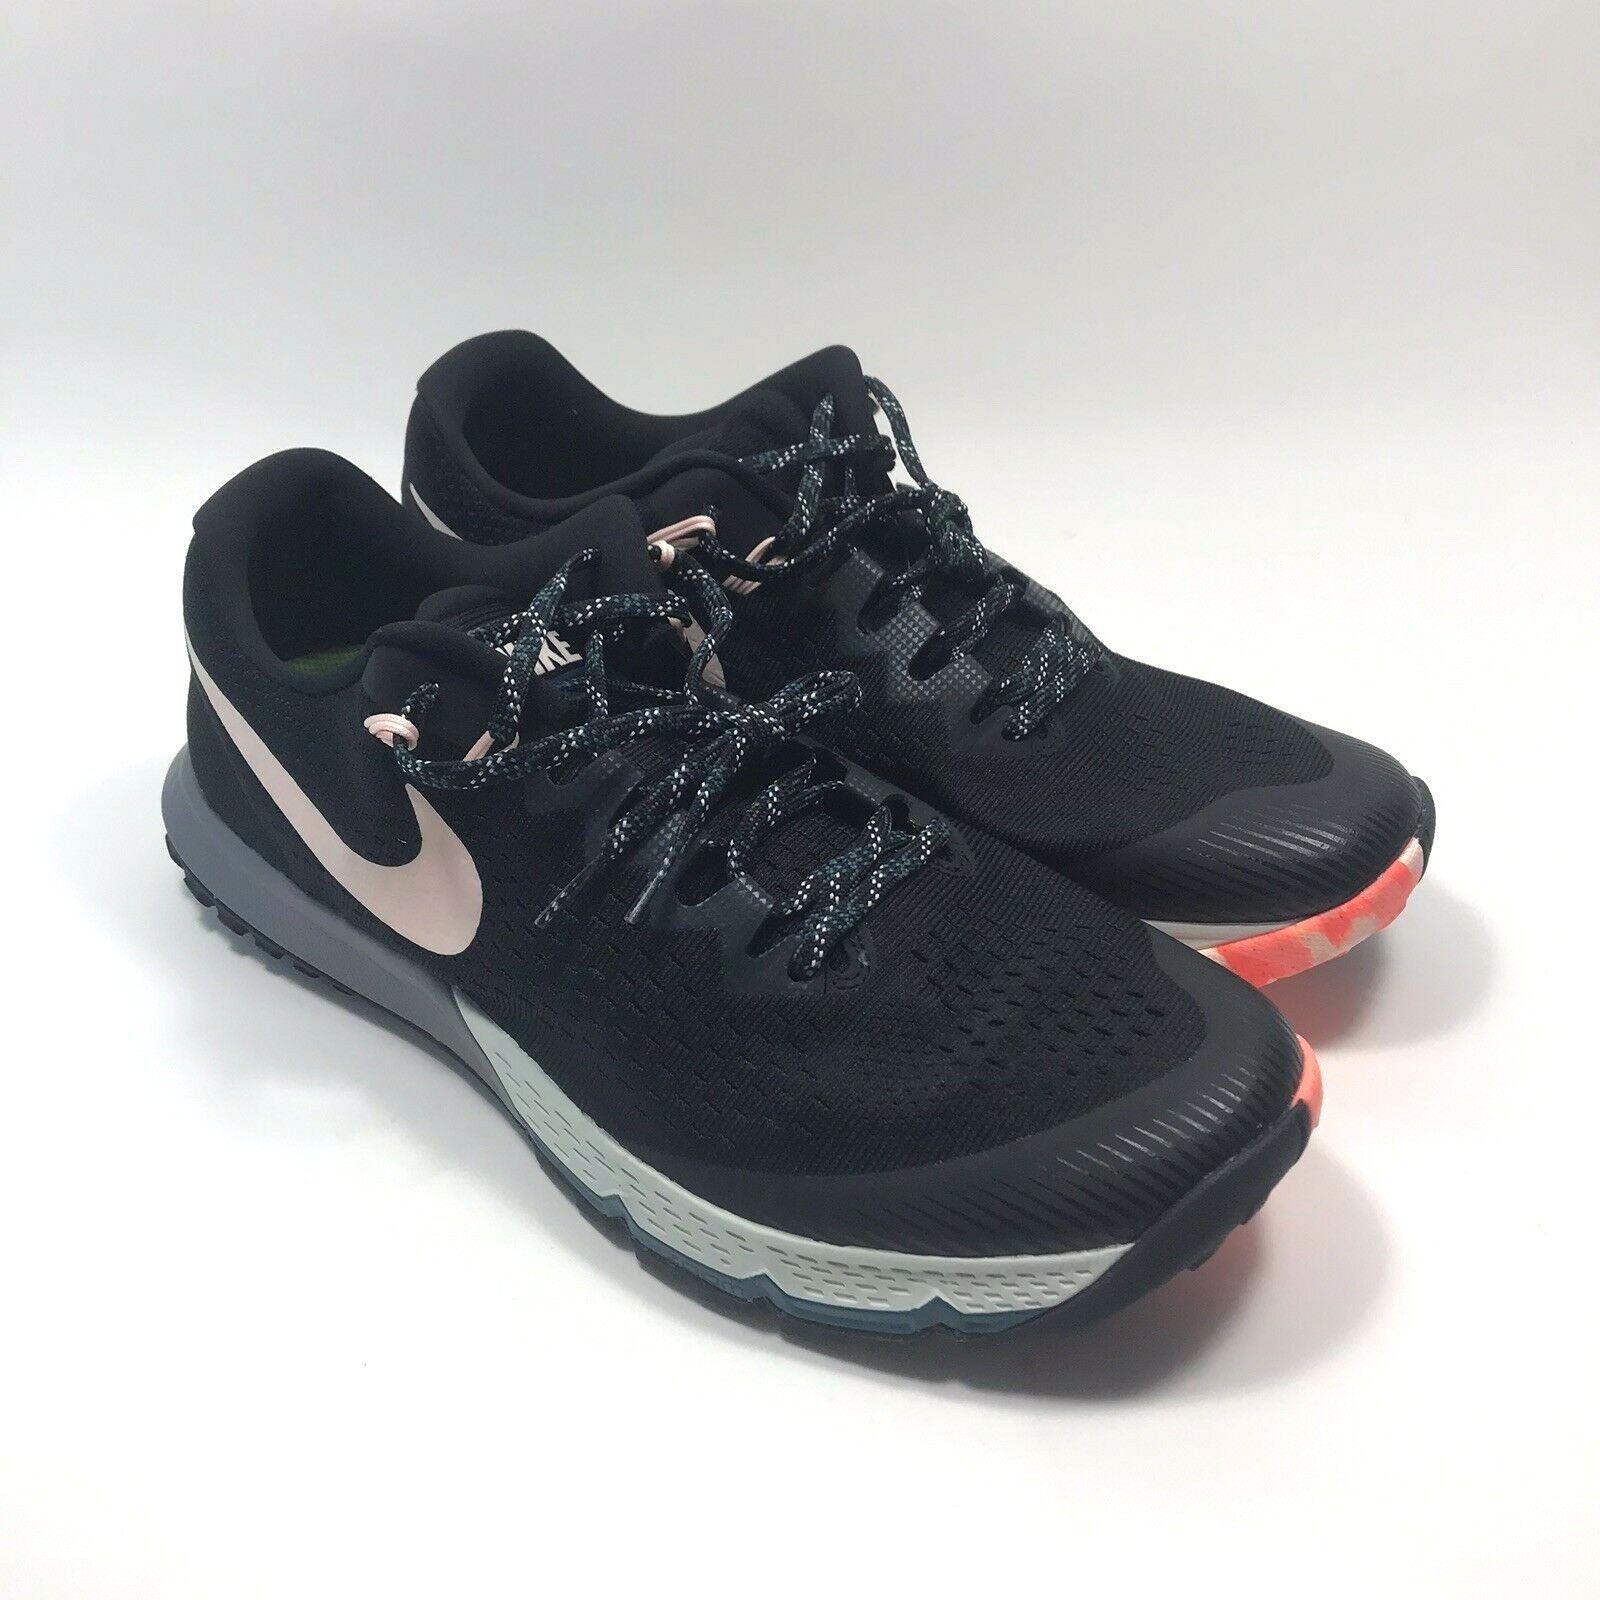 Nike Air Zoom Terra Kiger 4 trail shoes Black Men's Size 10 880563-004